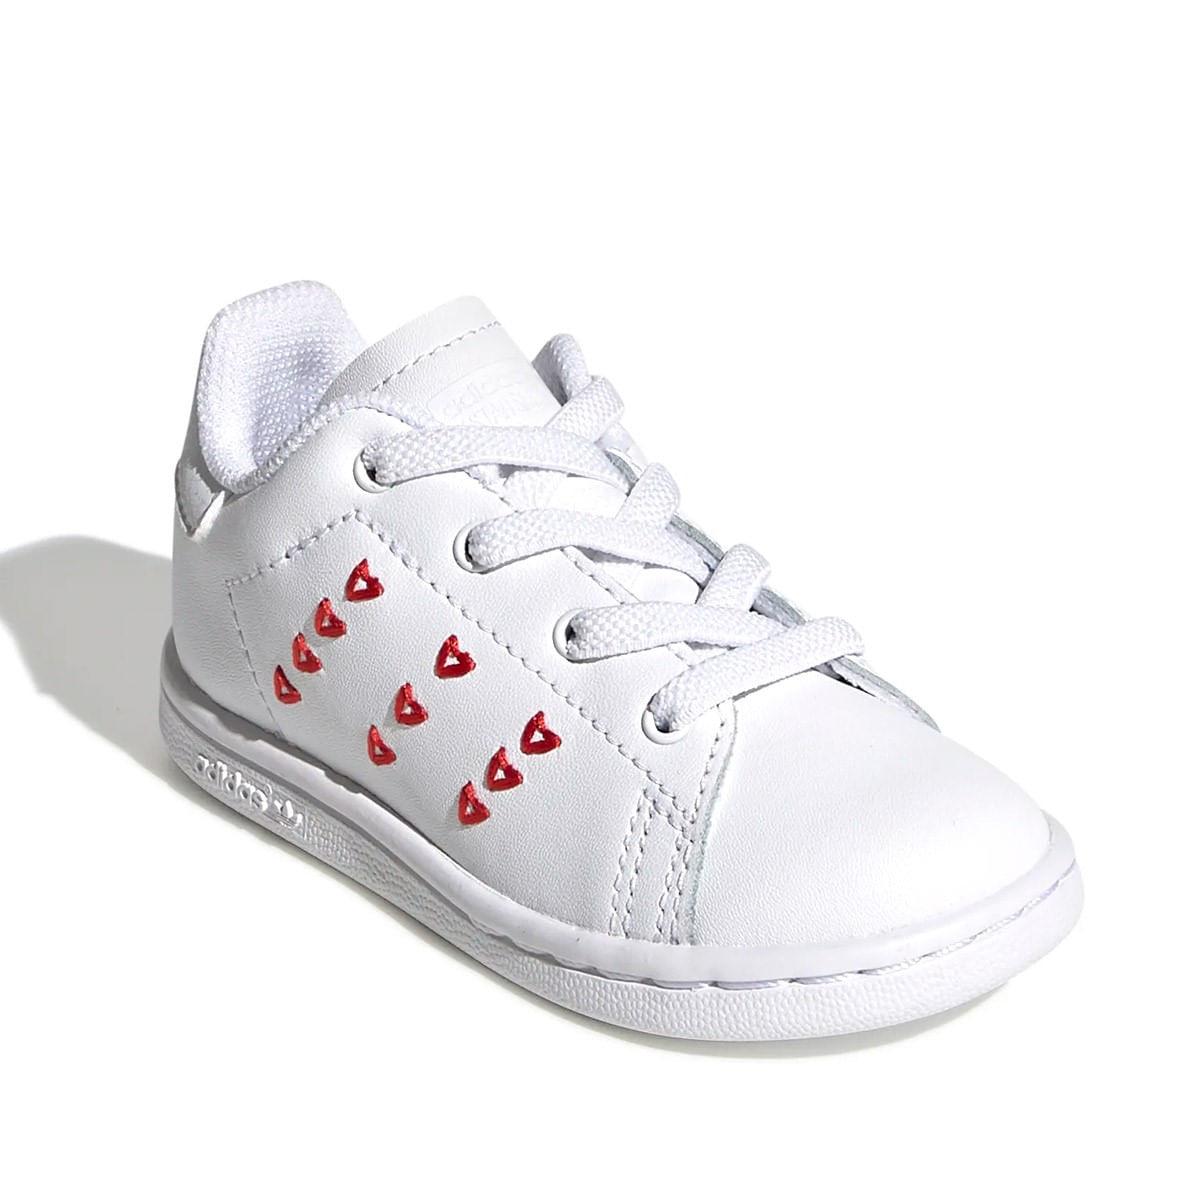 Tenis-Infantil-Adidas-Stan-Smith-El-l--18-ao-25-